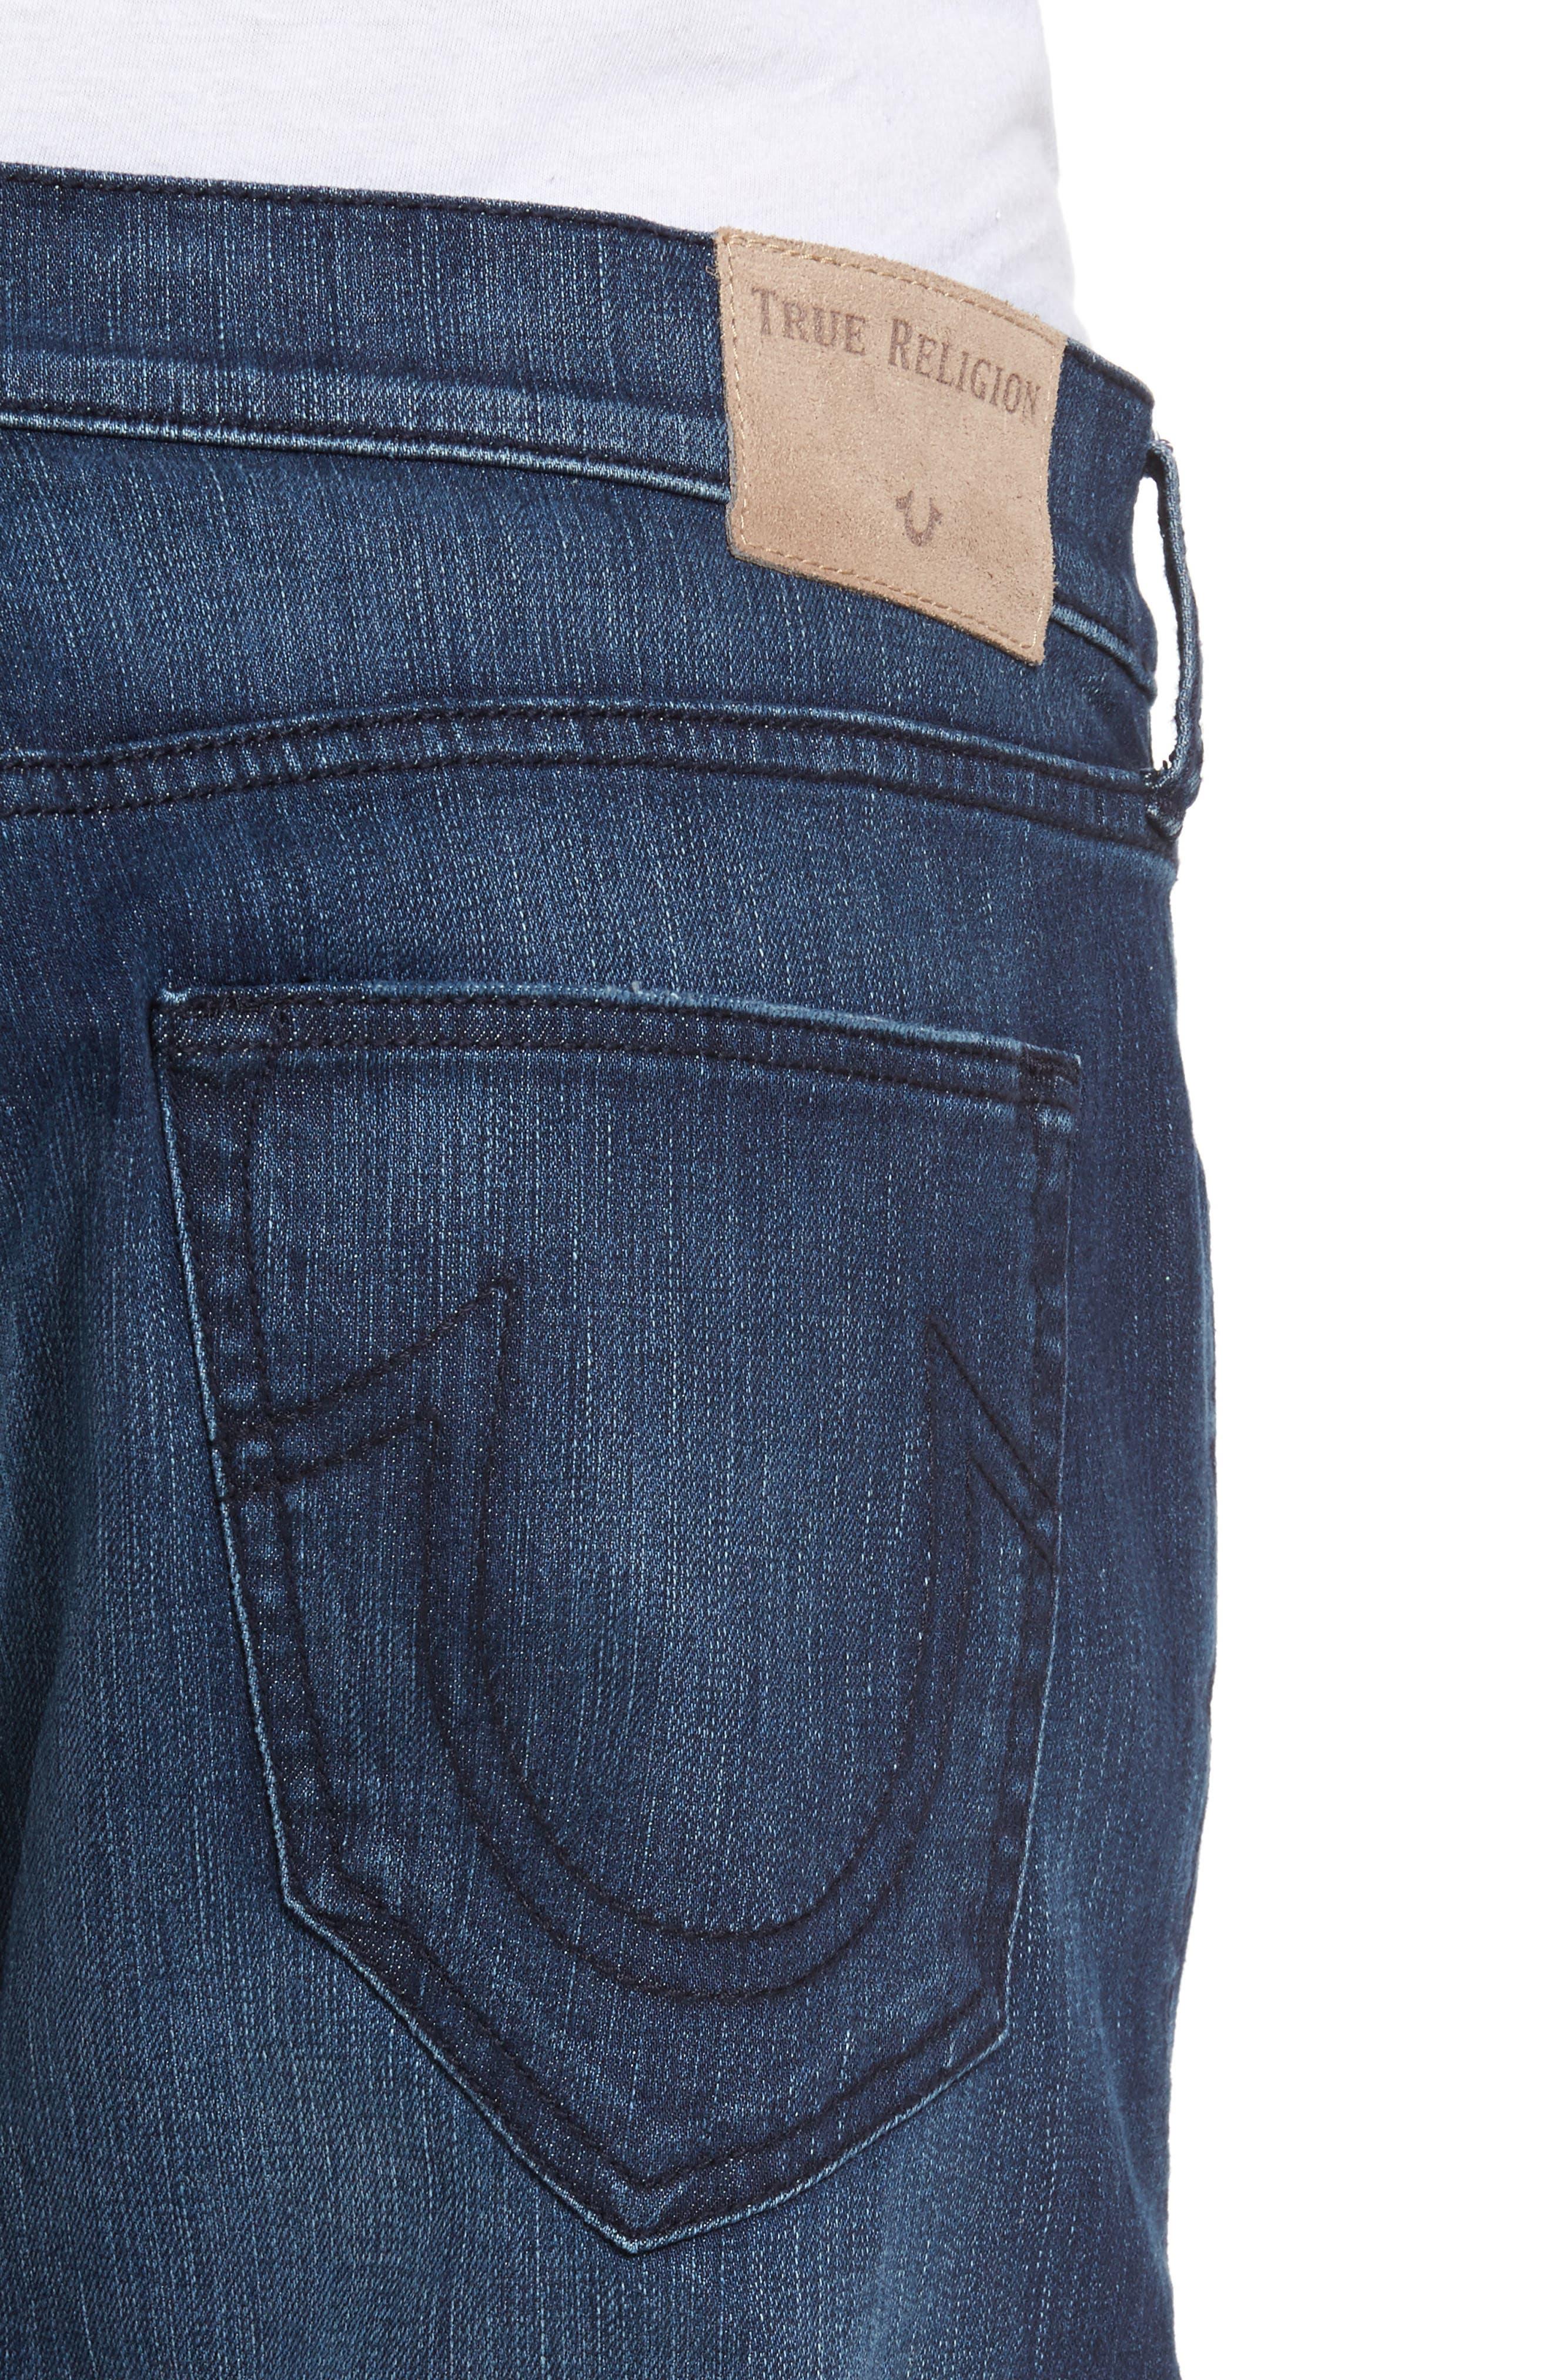 Alternate Image 4  - True Religion Brand Jeans Rocco Biker Skinny Fit Jeans (Rebel Race)